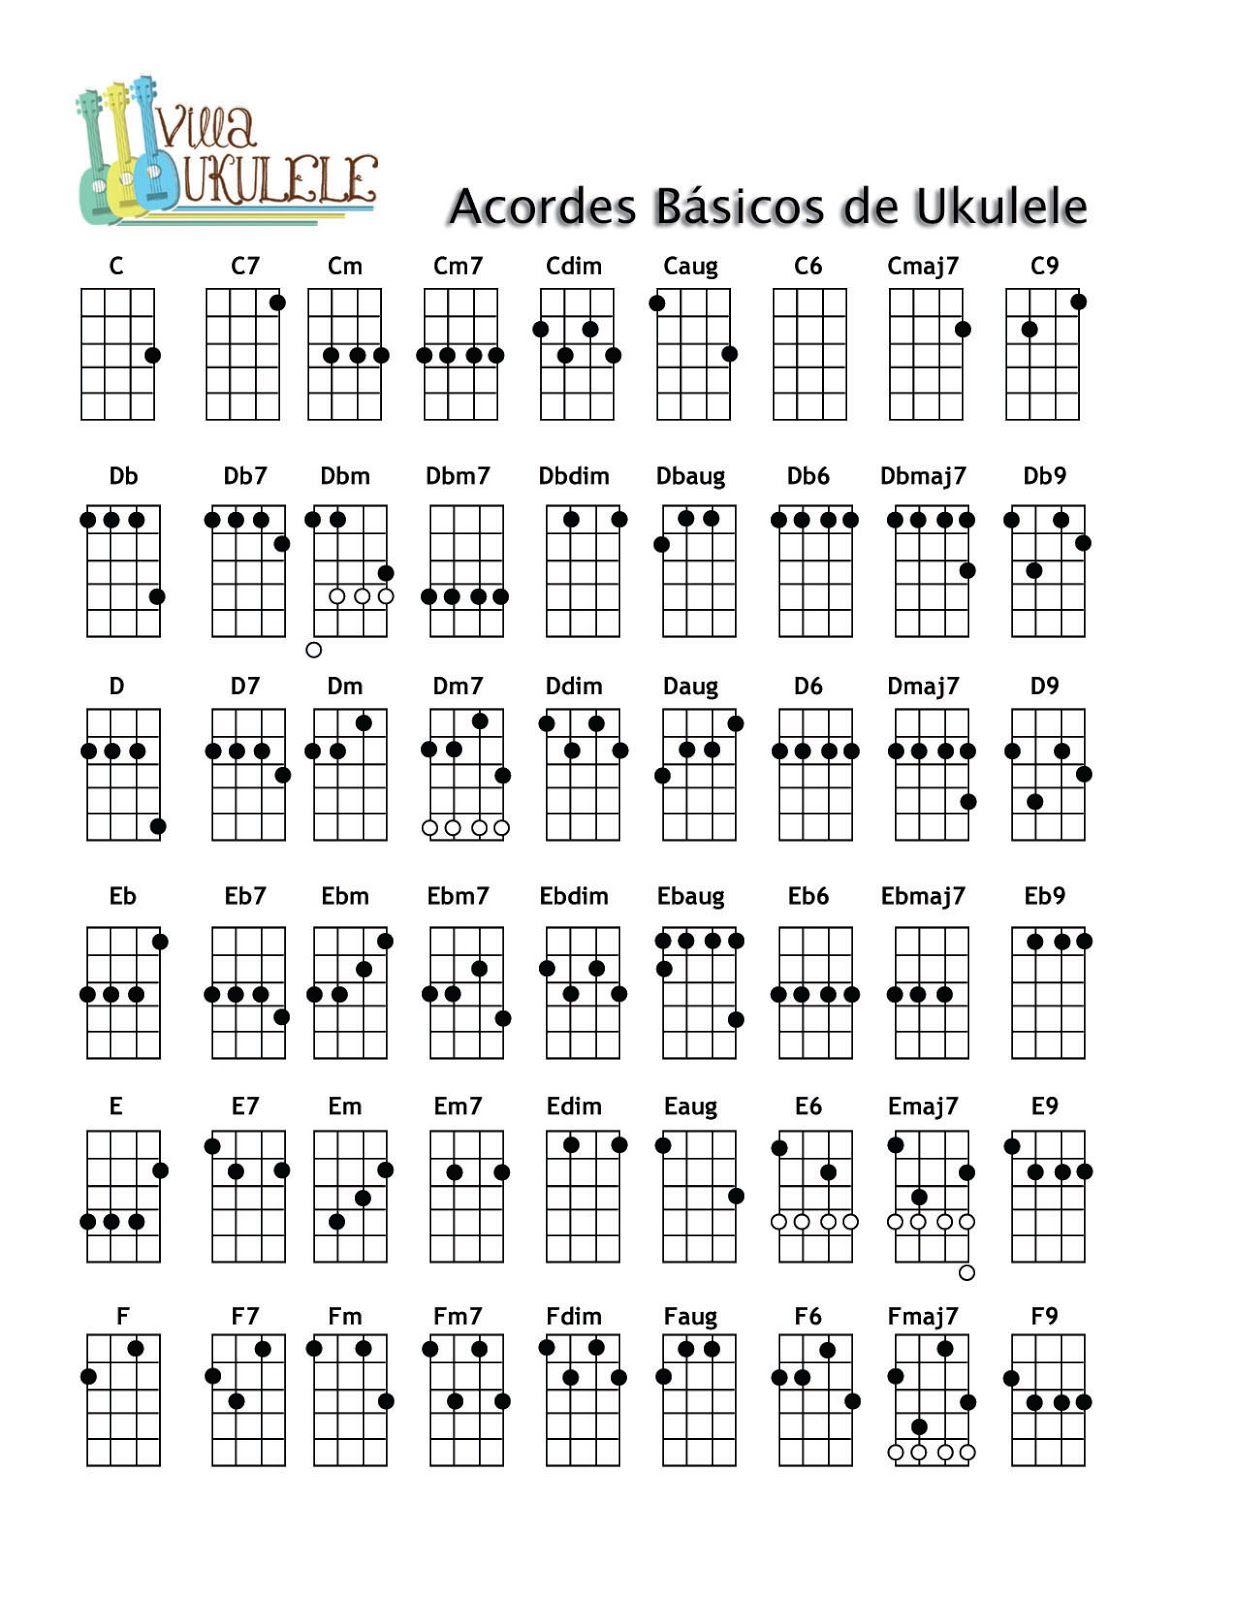 How to learn bossa nova on guitar